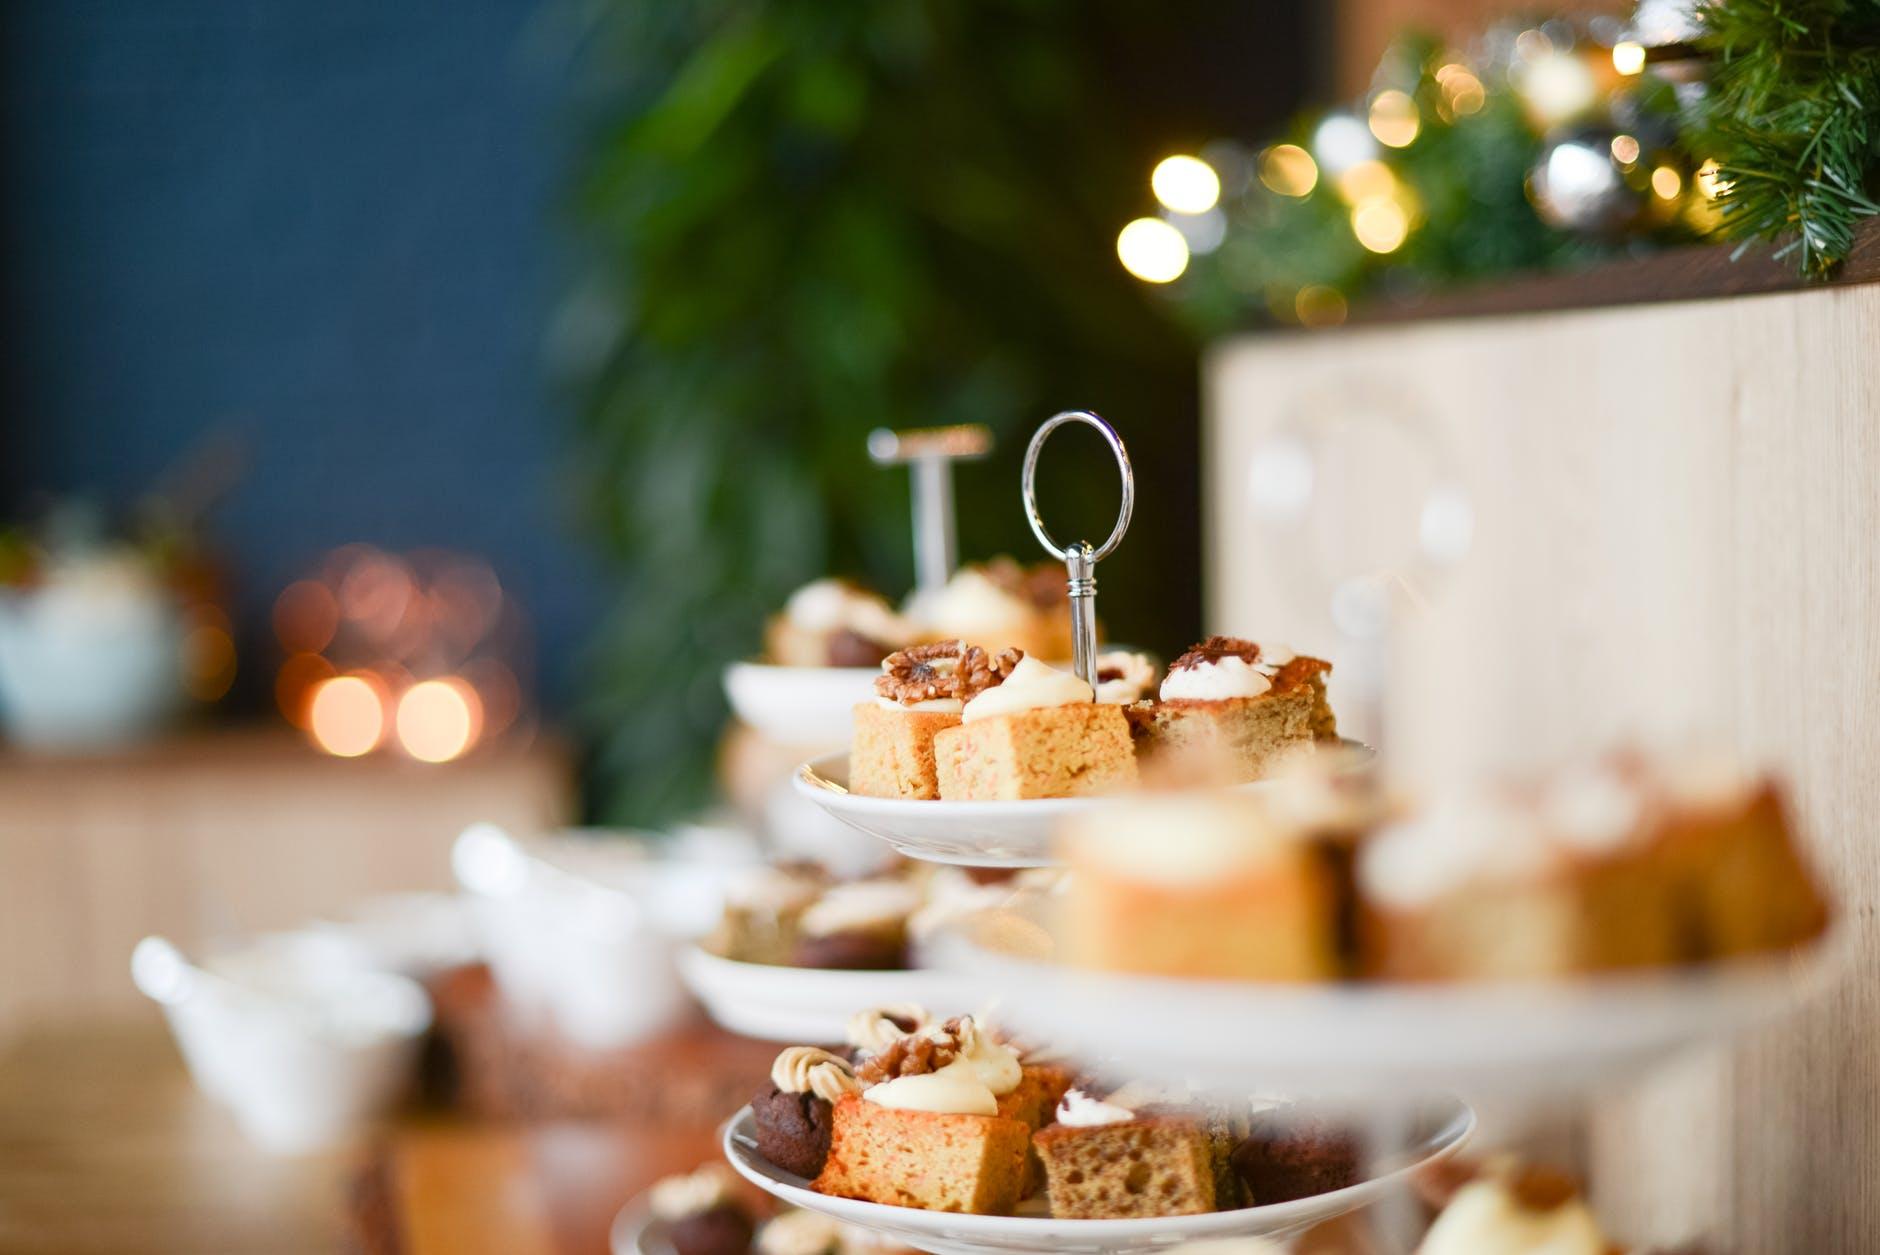 como hacer entrantes navideños en casa, ideas de tapas ricas para Navidad con recetas paso a paso